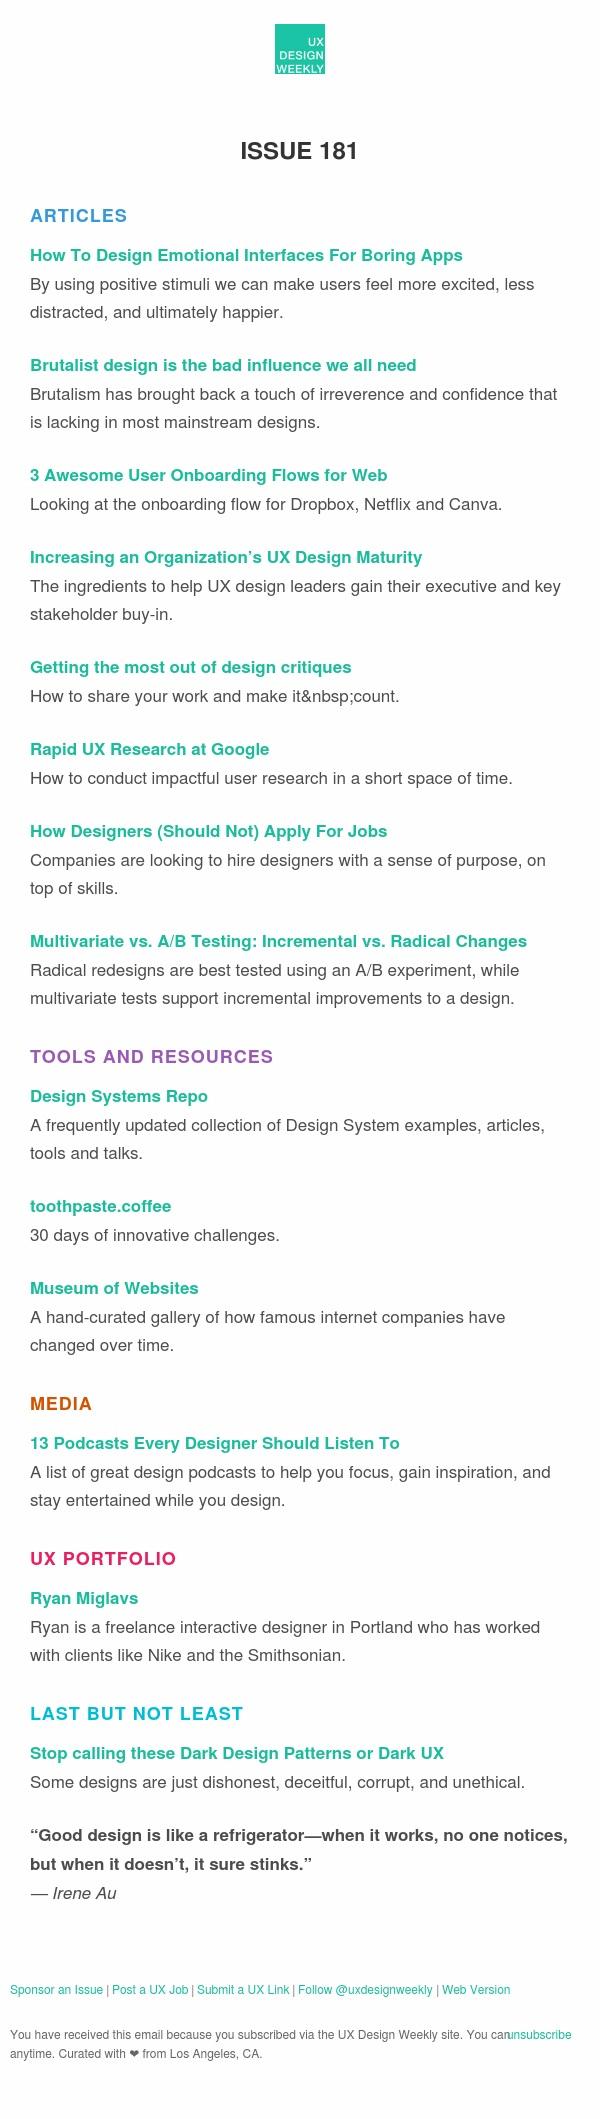 UX Design Weekly #181: Design Emotional UI's for Boring Apps, Brutalist Design, Rapid UX Research